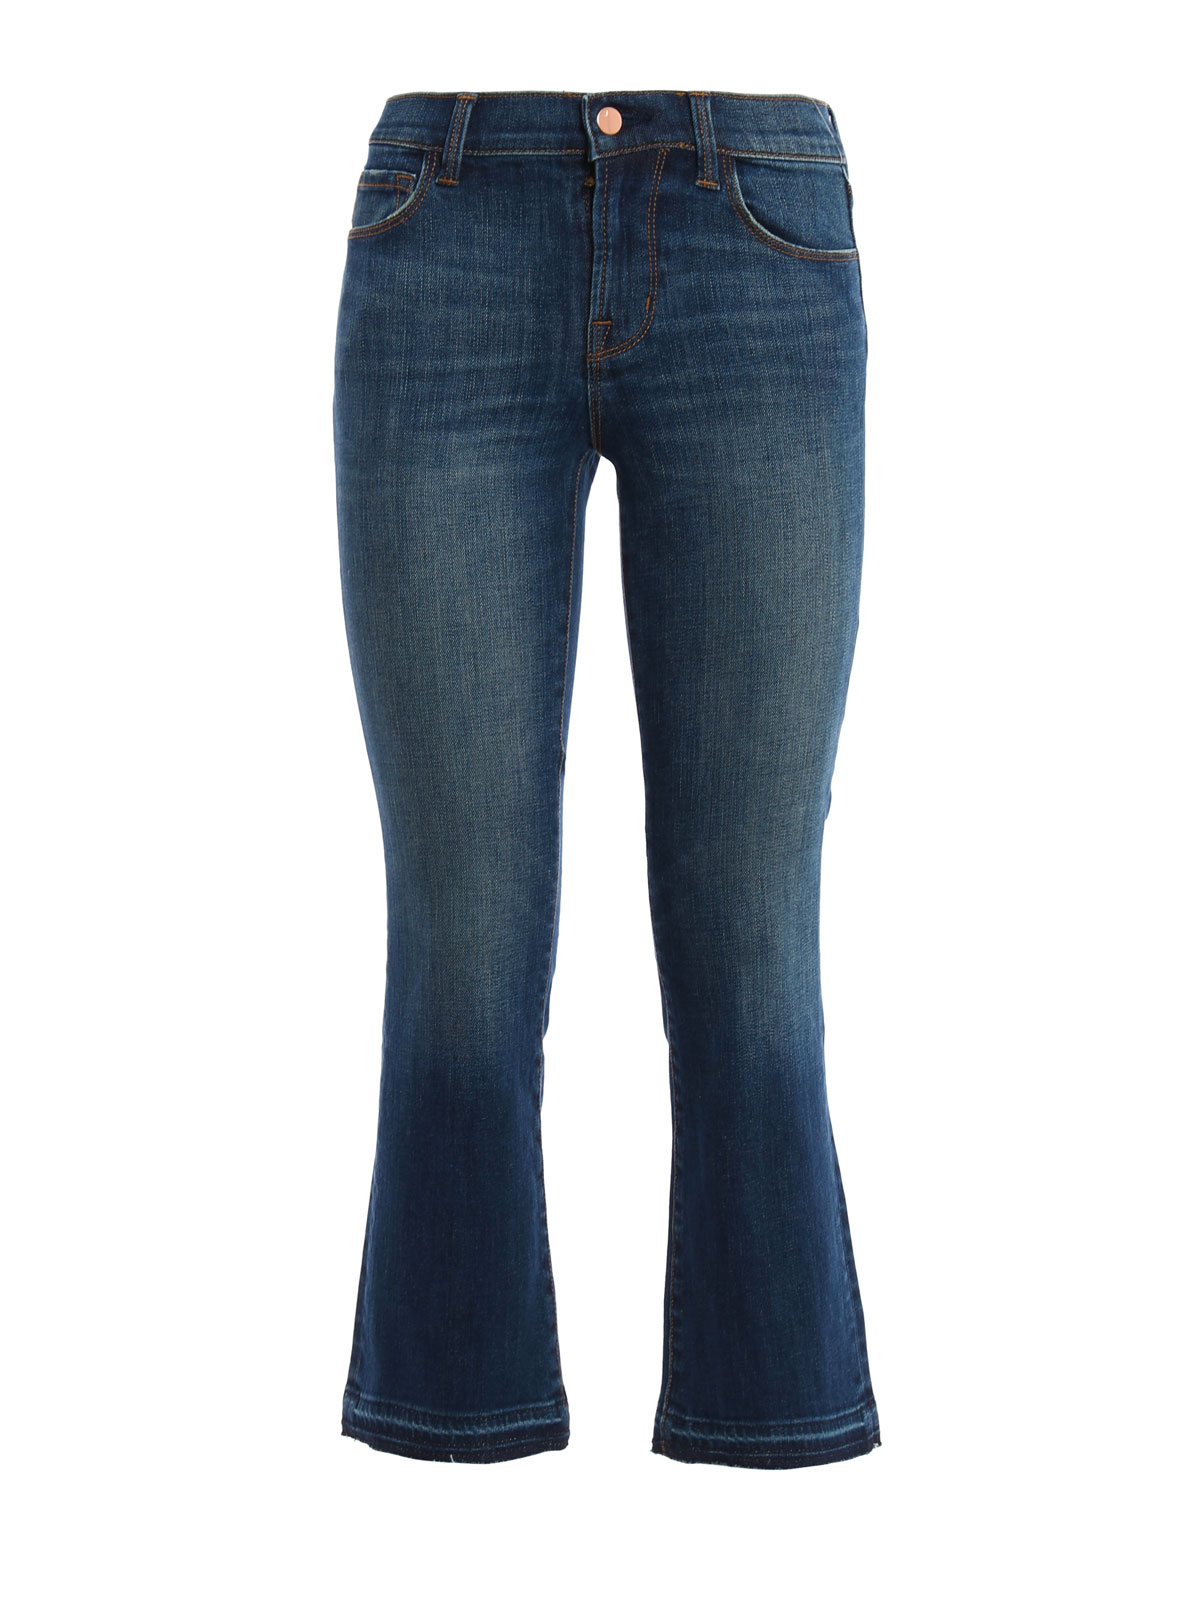 j brand selena bootcut jeans bootcut jeans jb000190. Black Bedroom Furniture Sets. Home Design Ideas